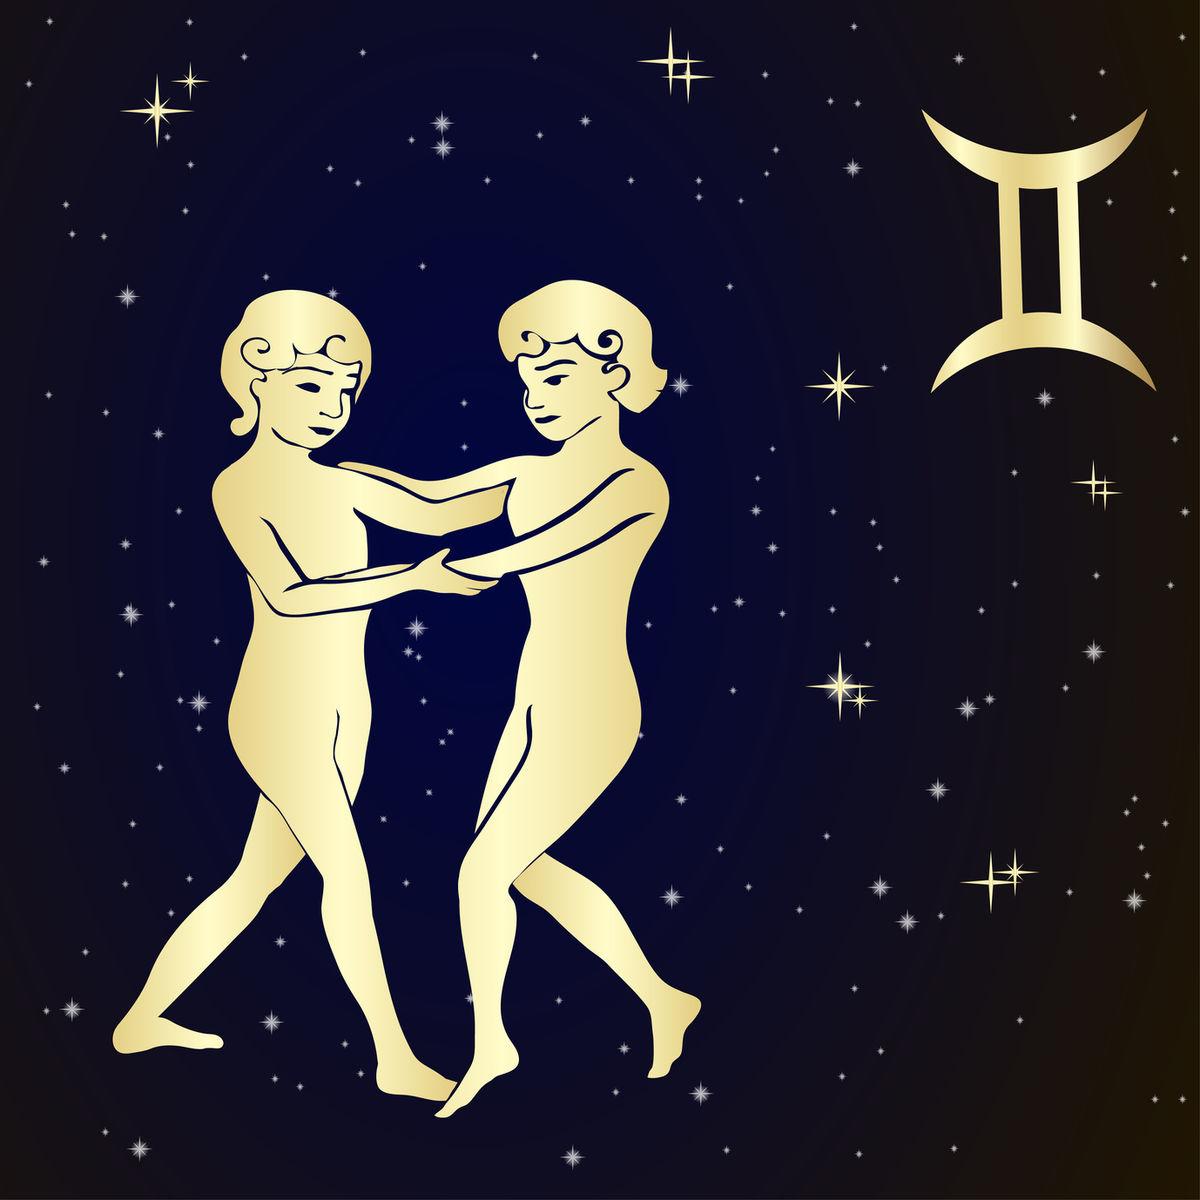 Даниил Под Знаком Зодиака Близнецы